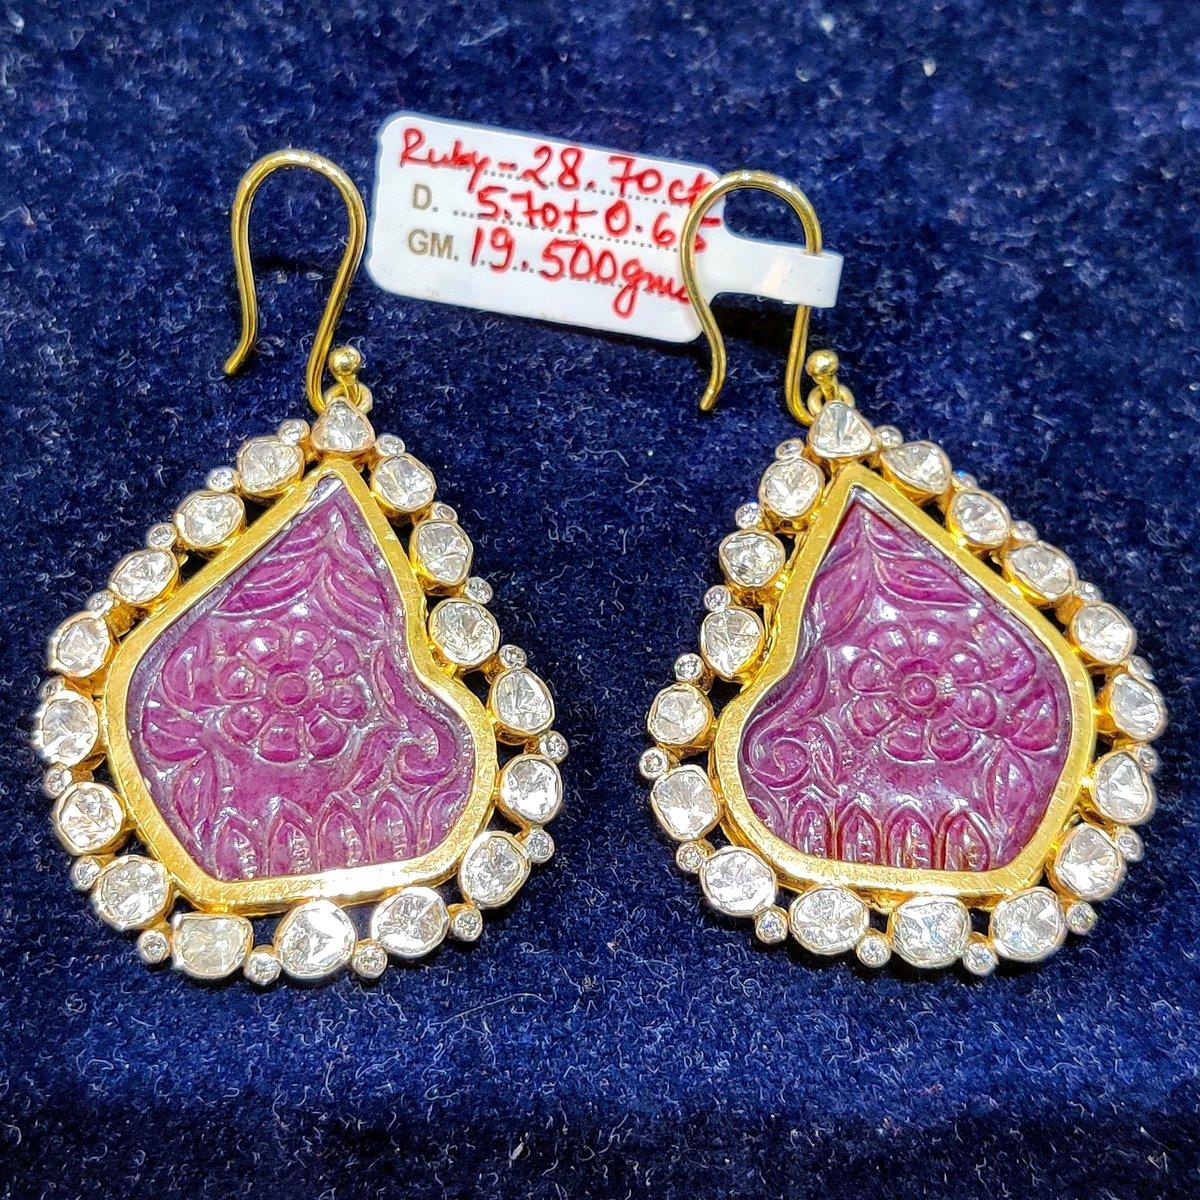 #jewellerydesigner #makersgonnamake #handmadejewellery #inspiremyinstagram #smallbusiness #handmadeisbetter #shopsmall #handcraftedjewelry #supportthemakers #craftsposure #jewelryartist #handmadebusiness #oneofakindjewelry #jewellerymaker #jewelrymaker #handmadewithlove  #etsy